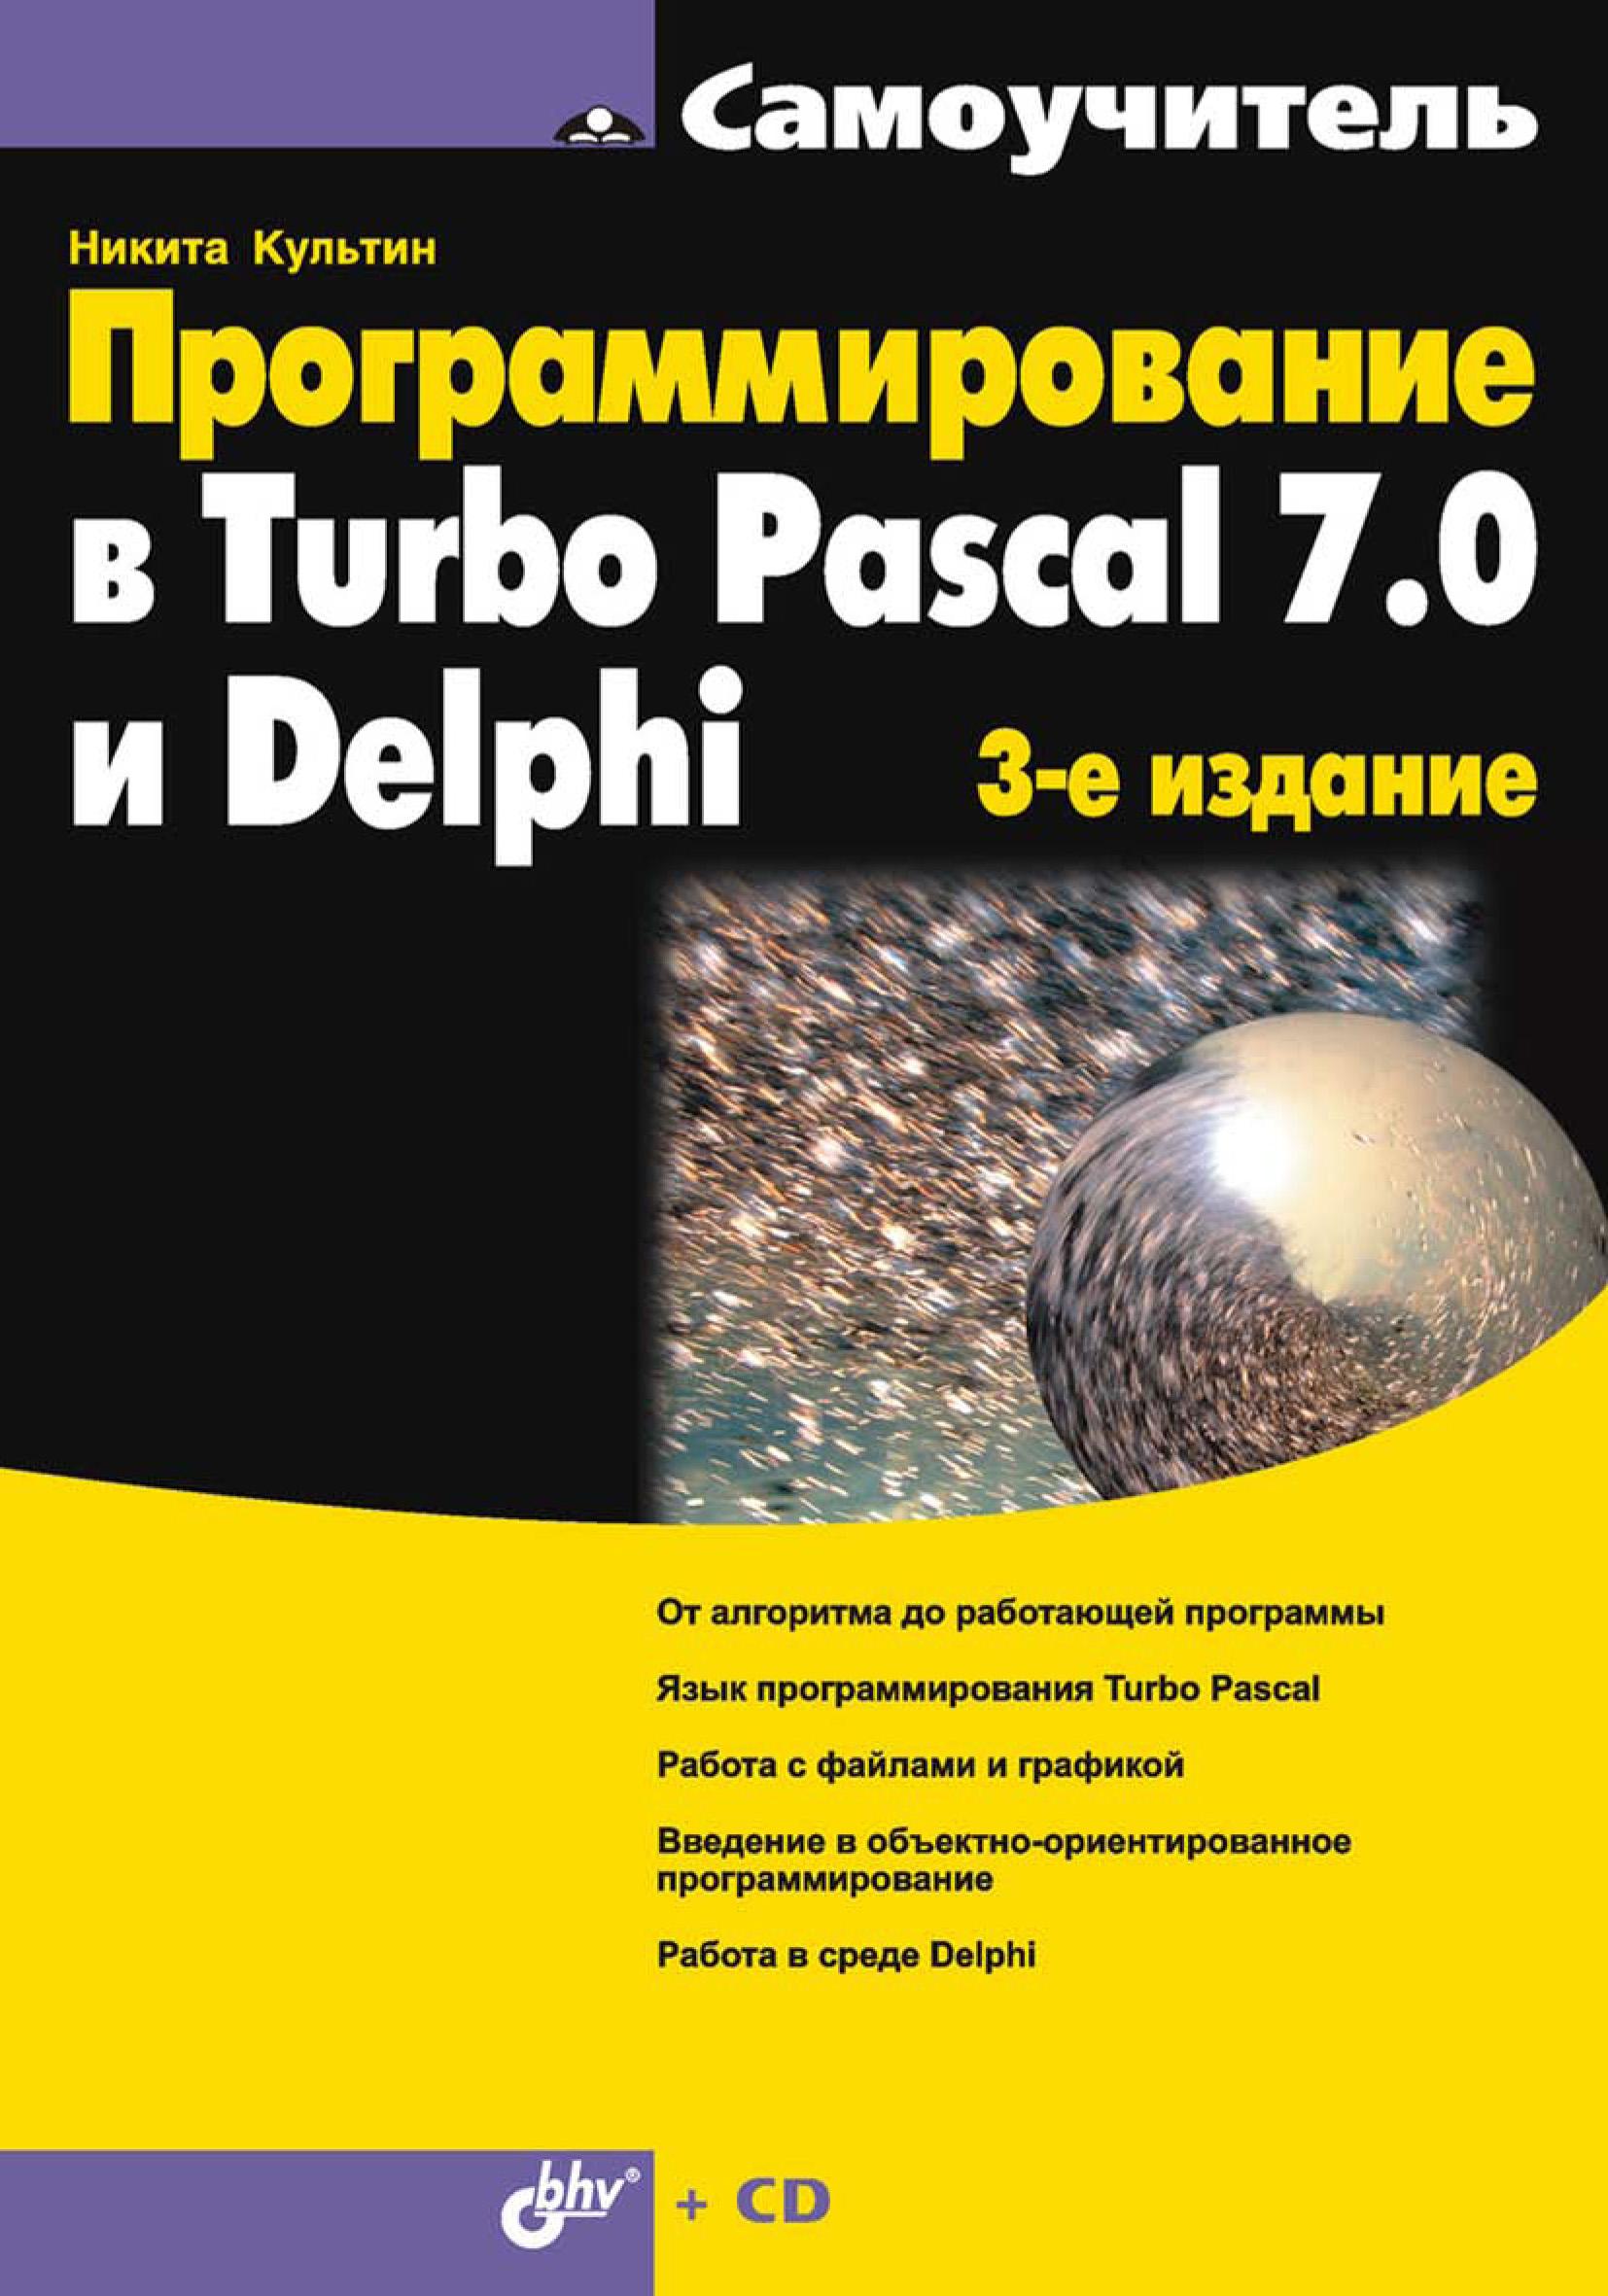 Никита Культин Программирование в Turbo Pascal 7.0 и Delphi